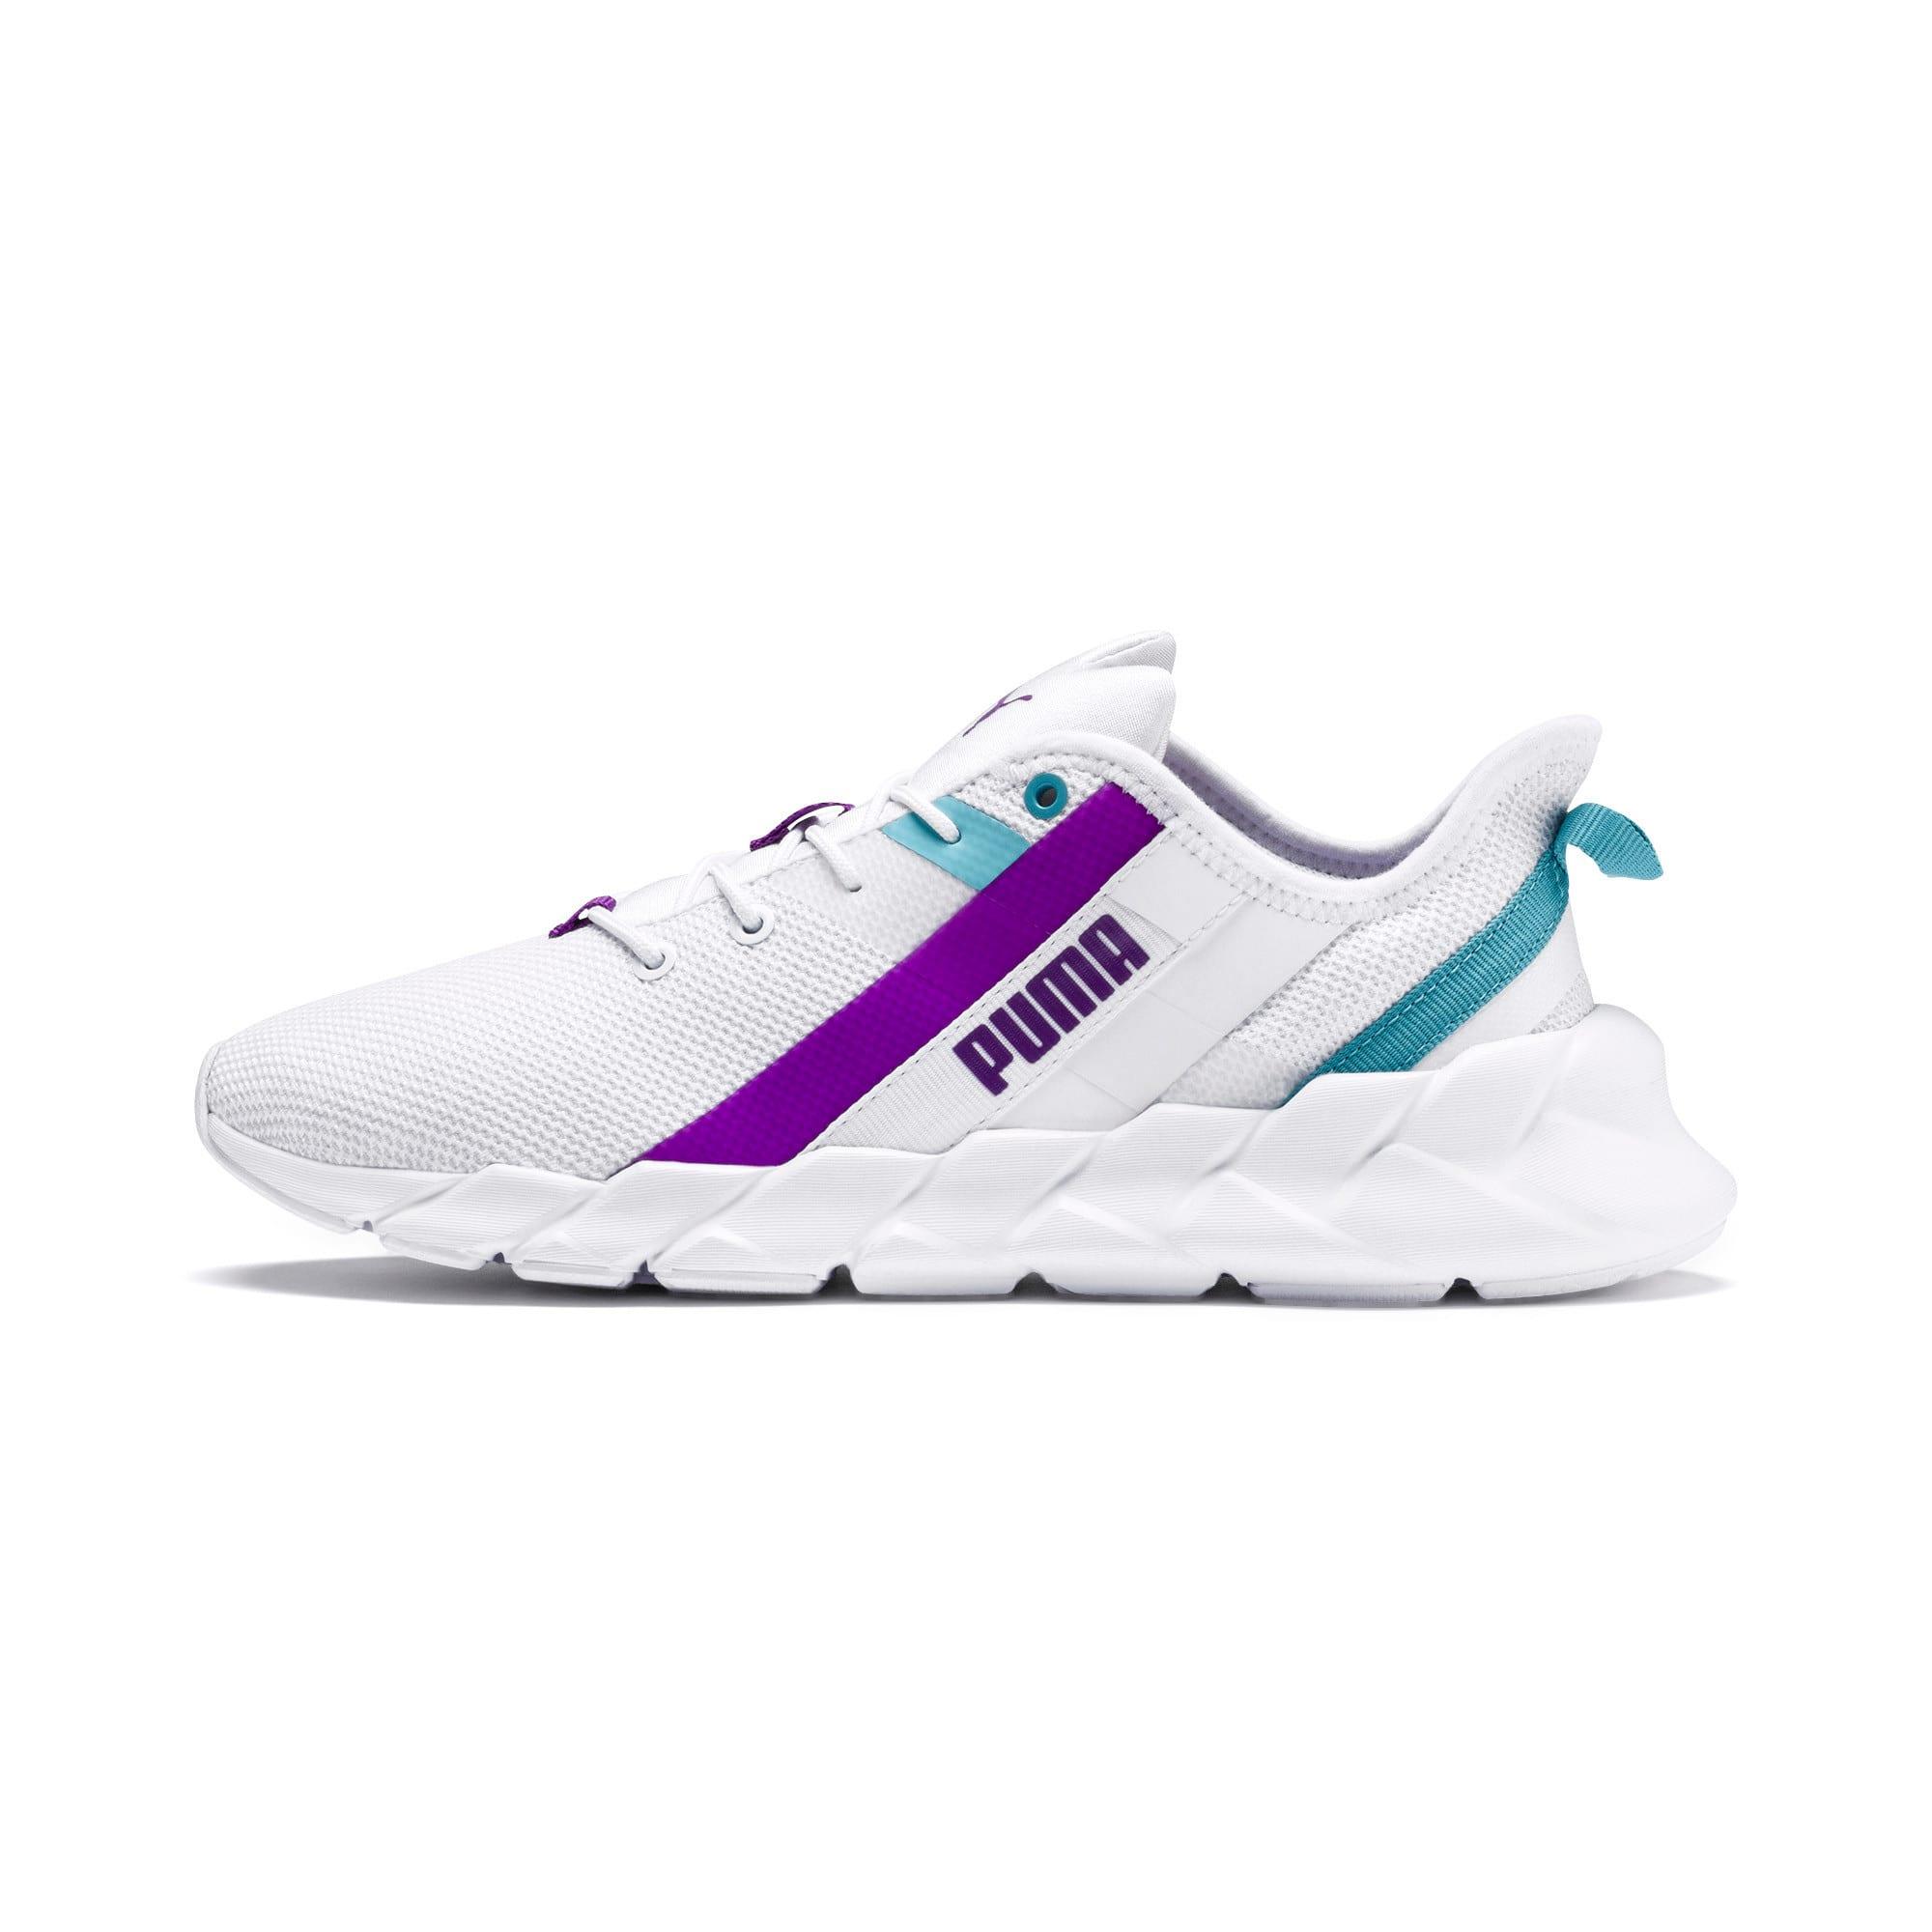 Thumbnail 1 of Weave XT Training Shoes JR, White-Milky Blue-Royal Lilac, medium